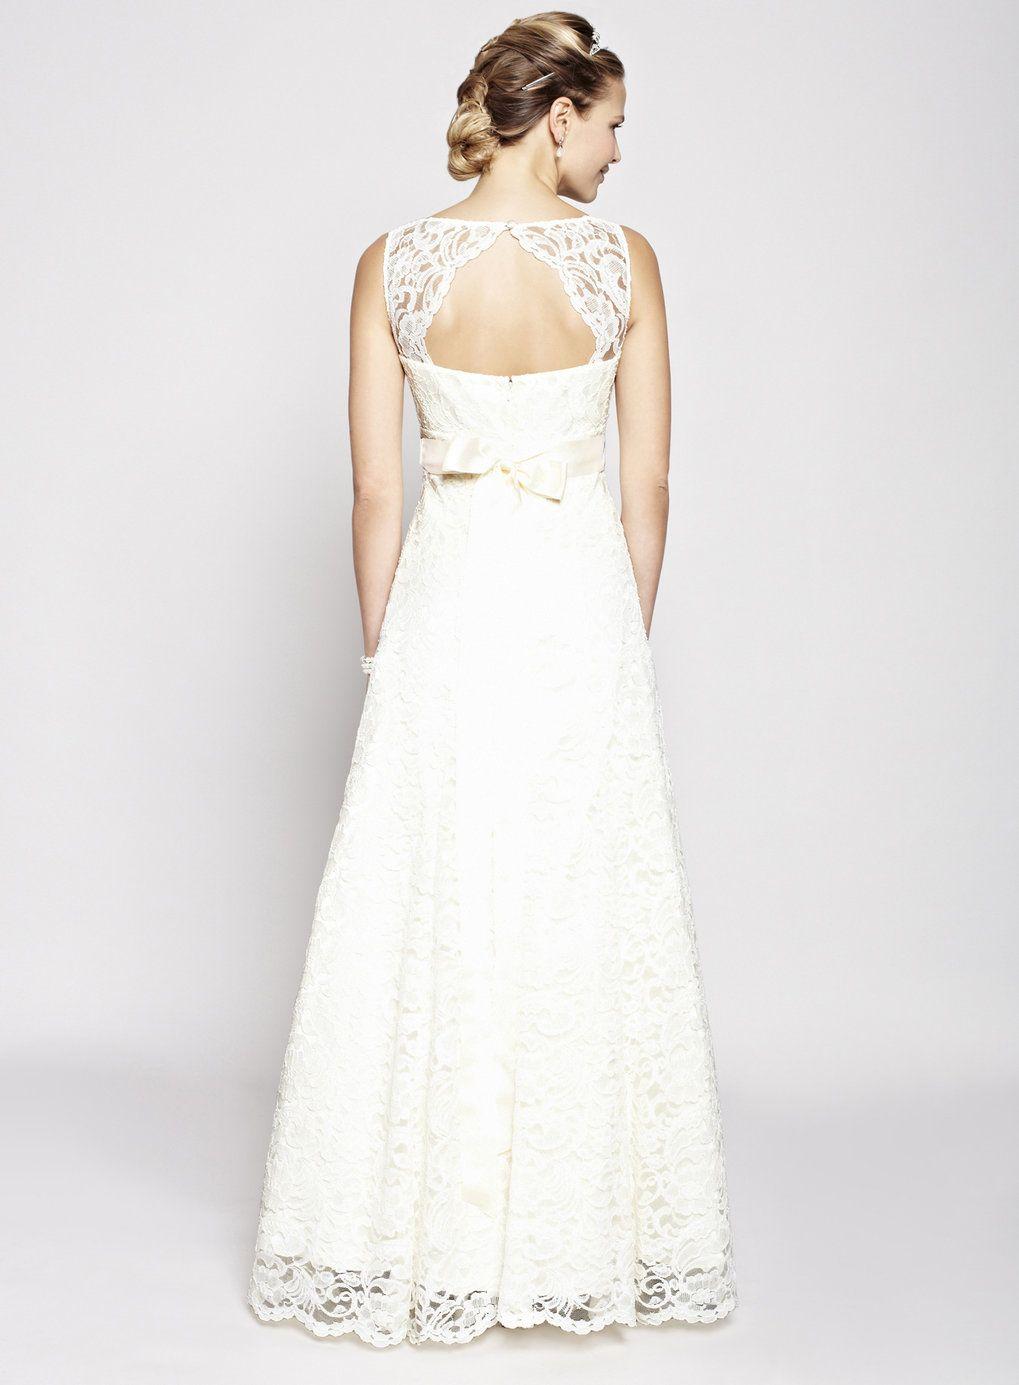 Ivory bella lace wedding dress wedding dresses wedding bhs ivory bella lace wedding dress wedding dresses wedding bhs ombrellifo Gallery